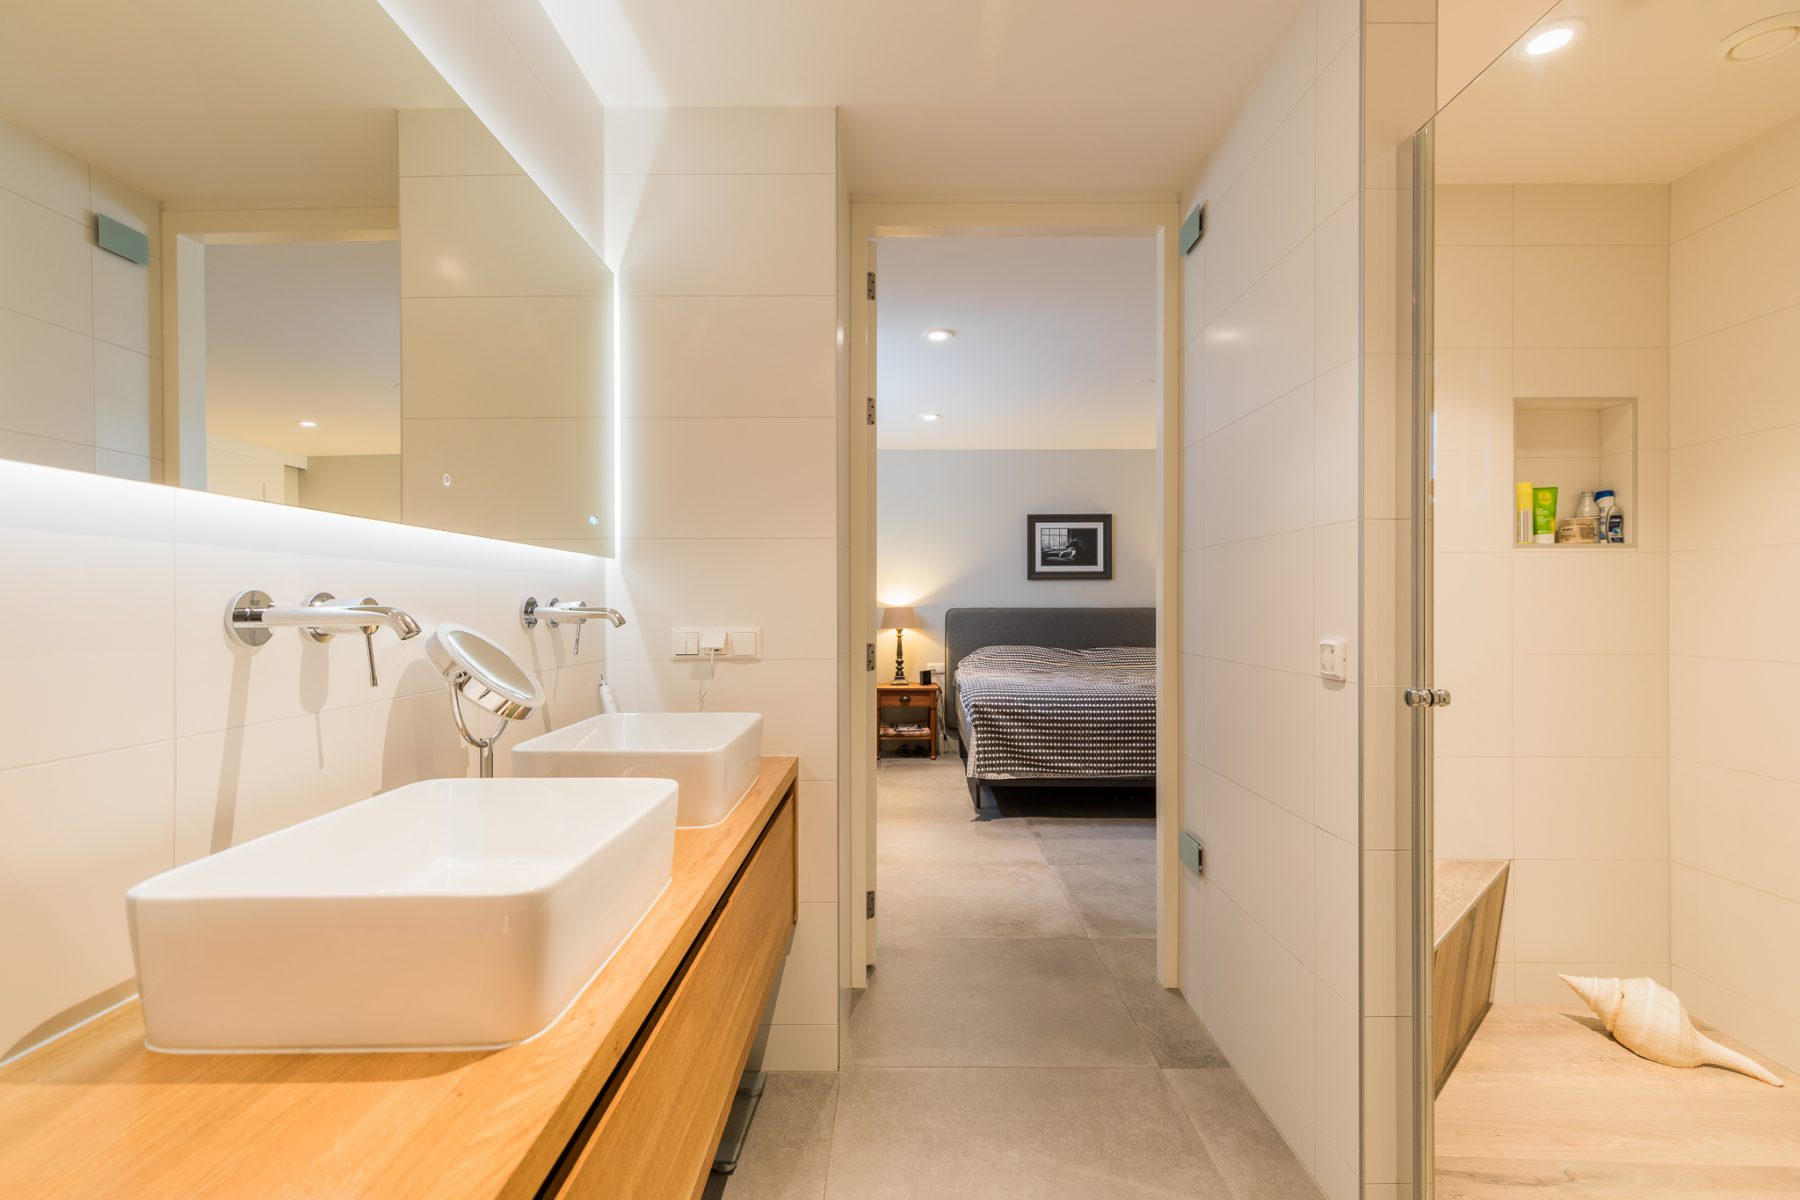 Badkamer en slaapkamer in het souterrain